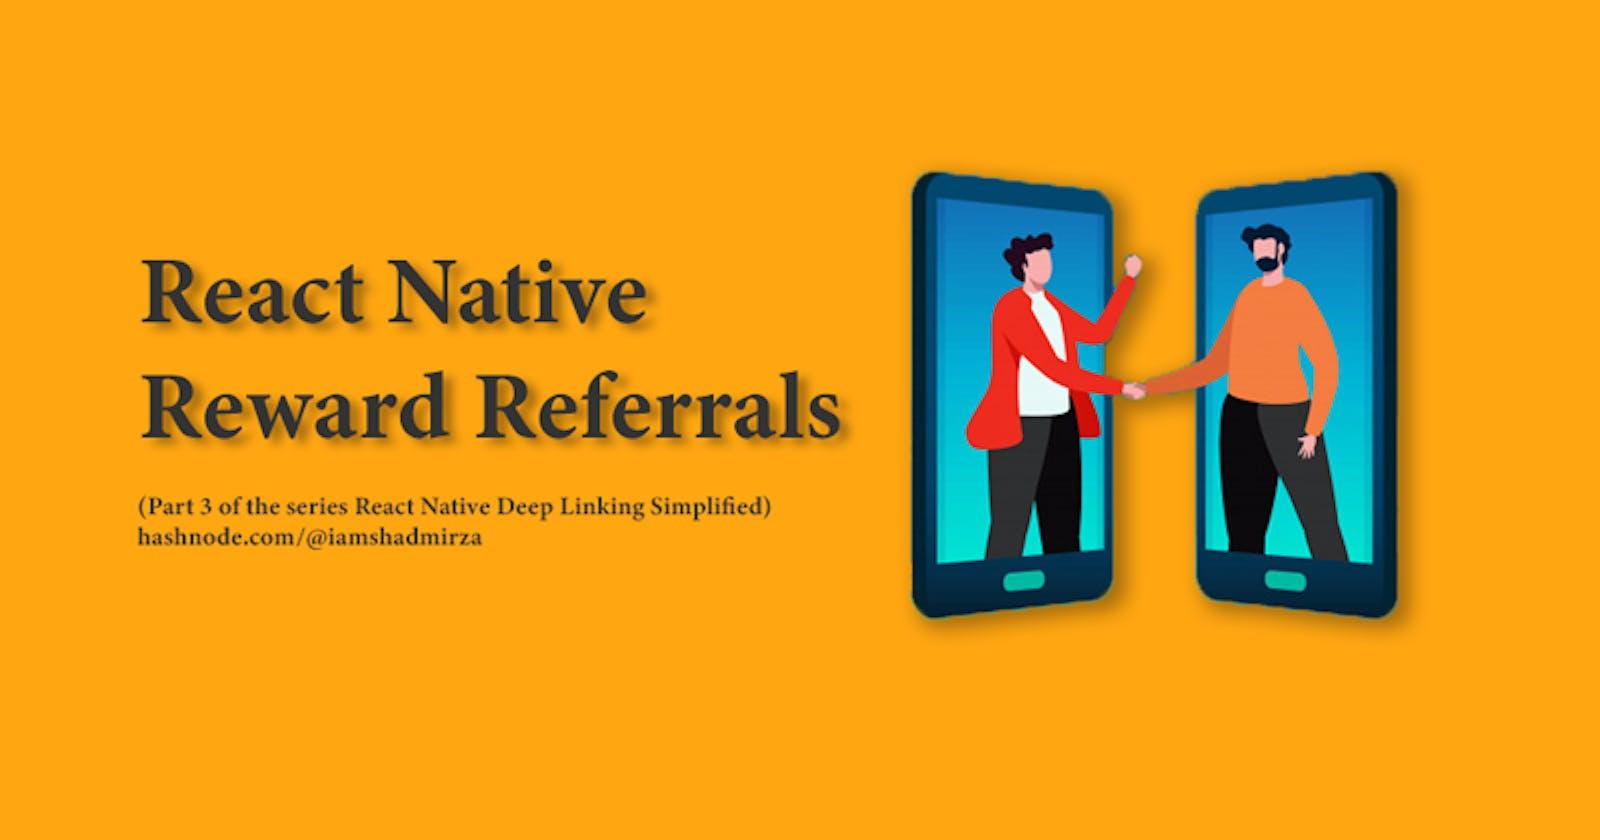 React Native Reward Referrals